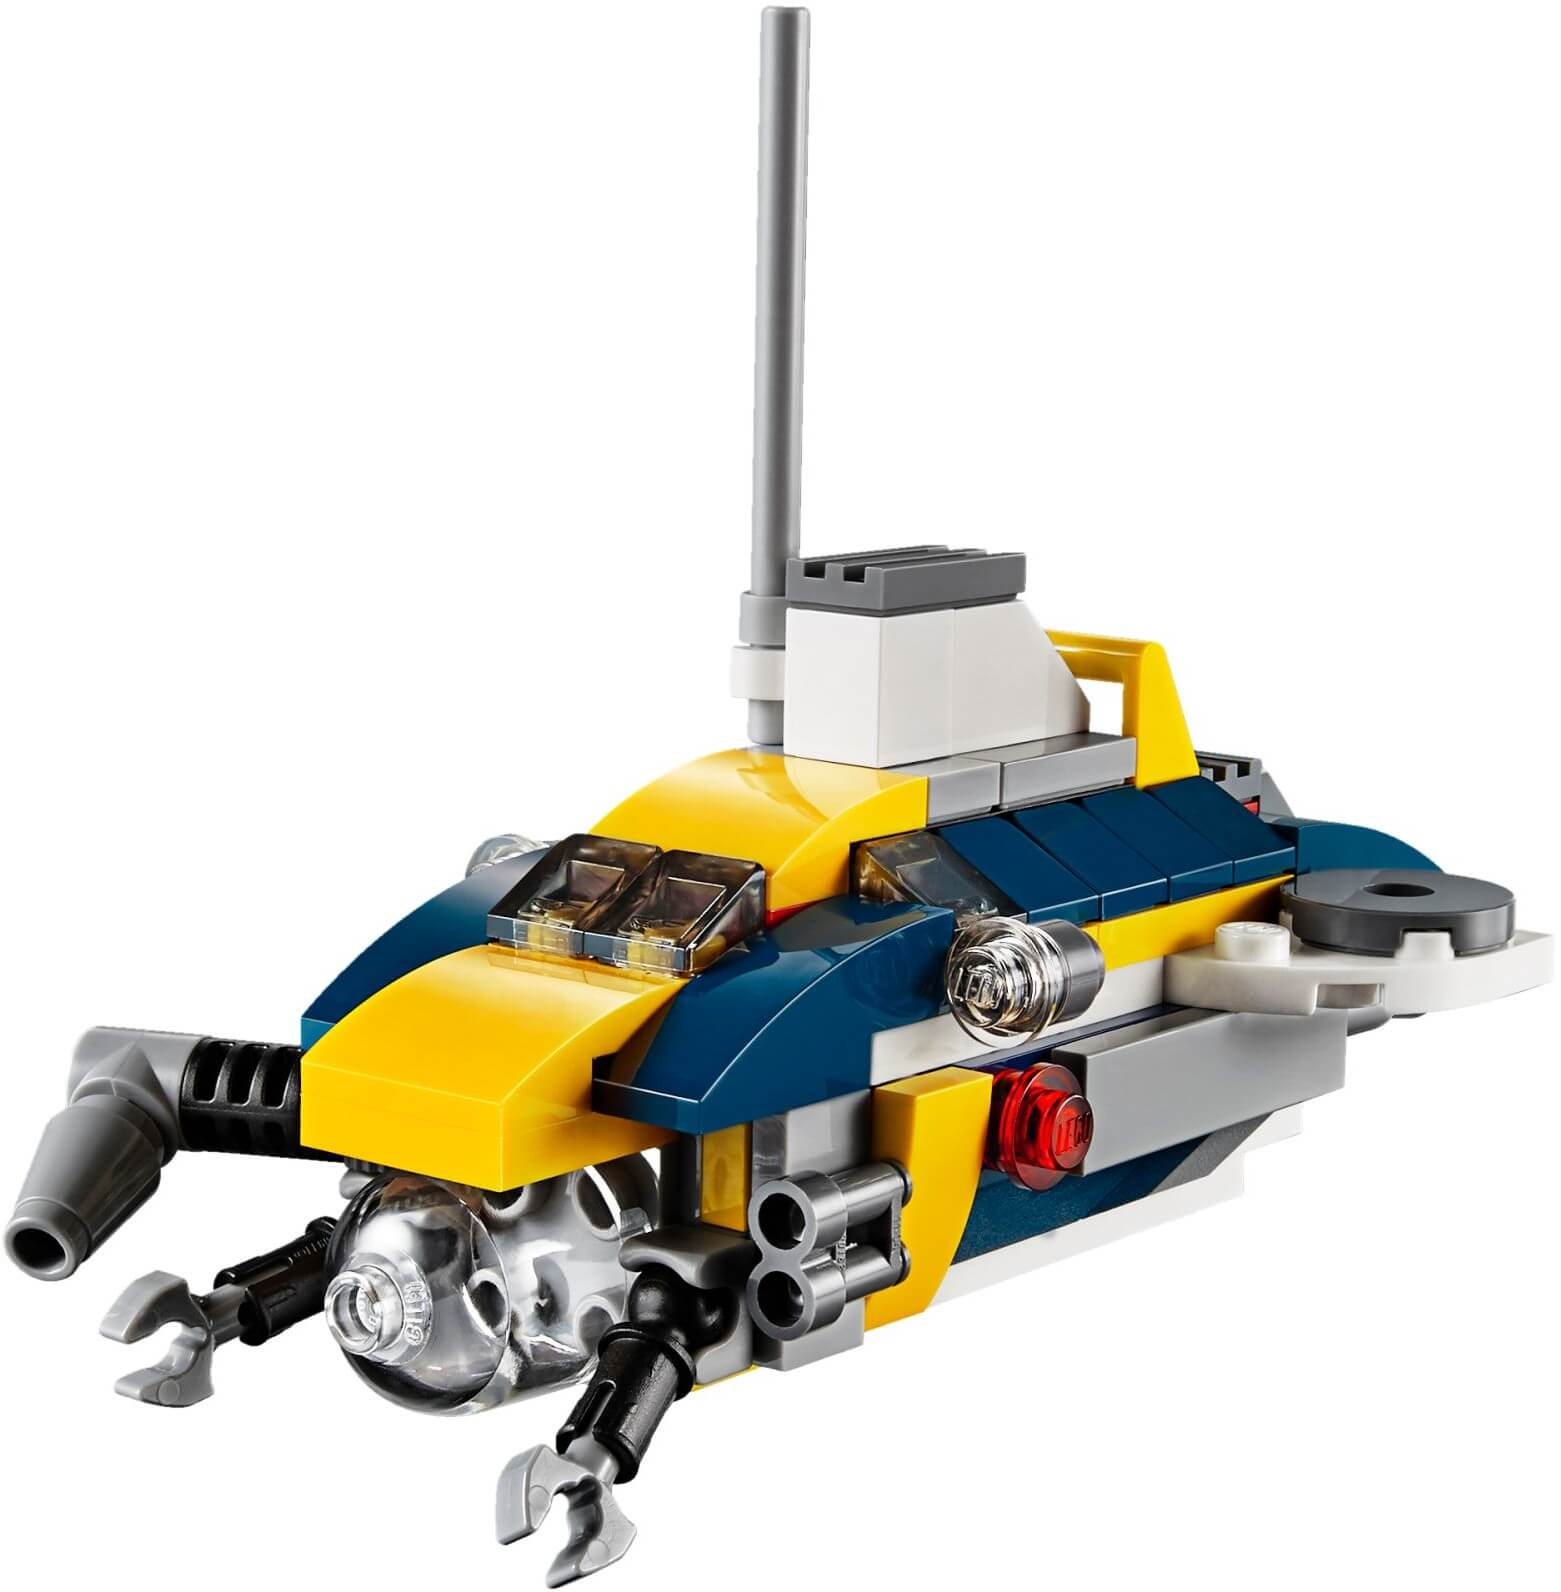 Mua đồ chơi LEGO 31045 - LEGO Creator 31045 - Tàu Thám hiểm Đại Dương (LEGO Creator Ocean Explorer 31045)